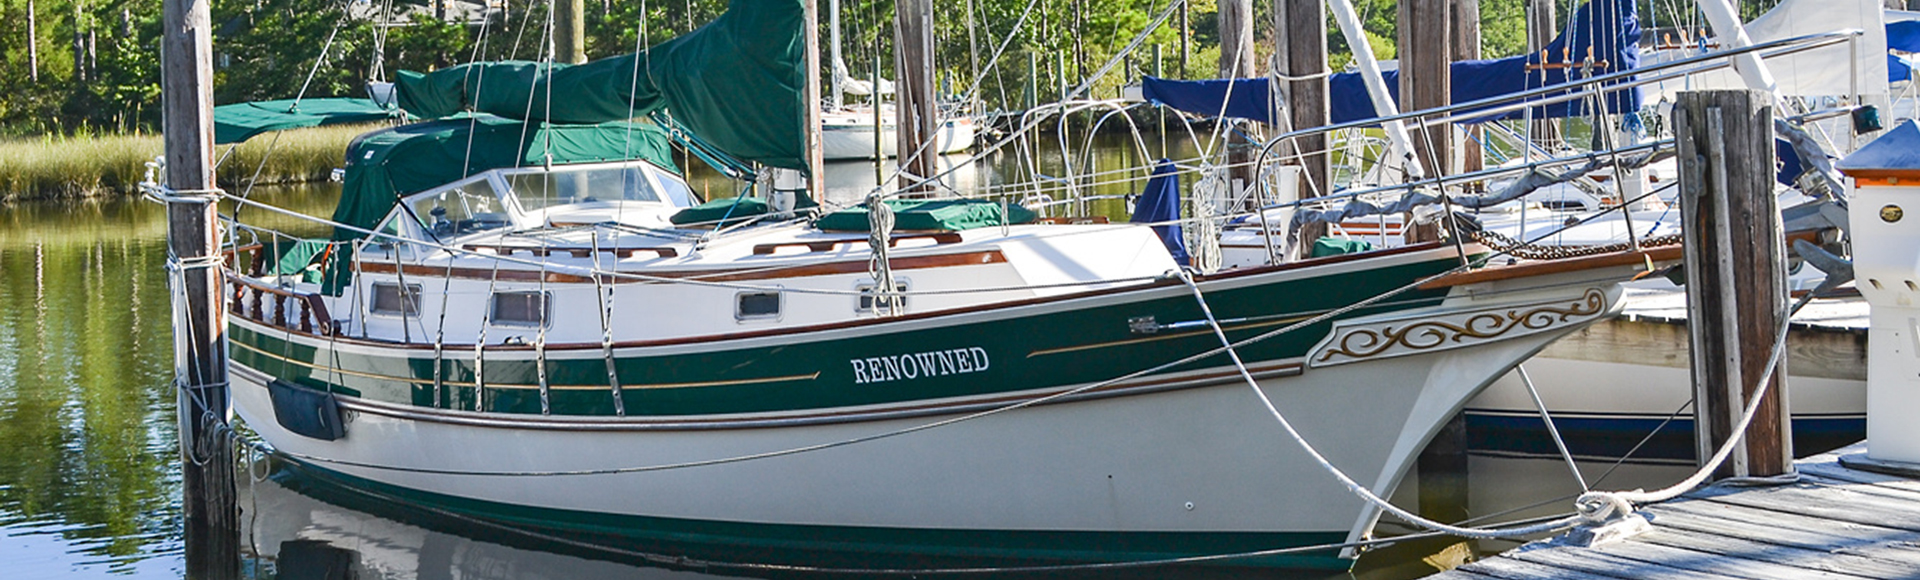 "1989 Gozzard 36 Hull #42 ""Renowned"""